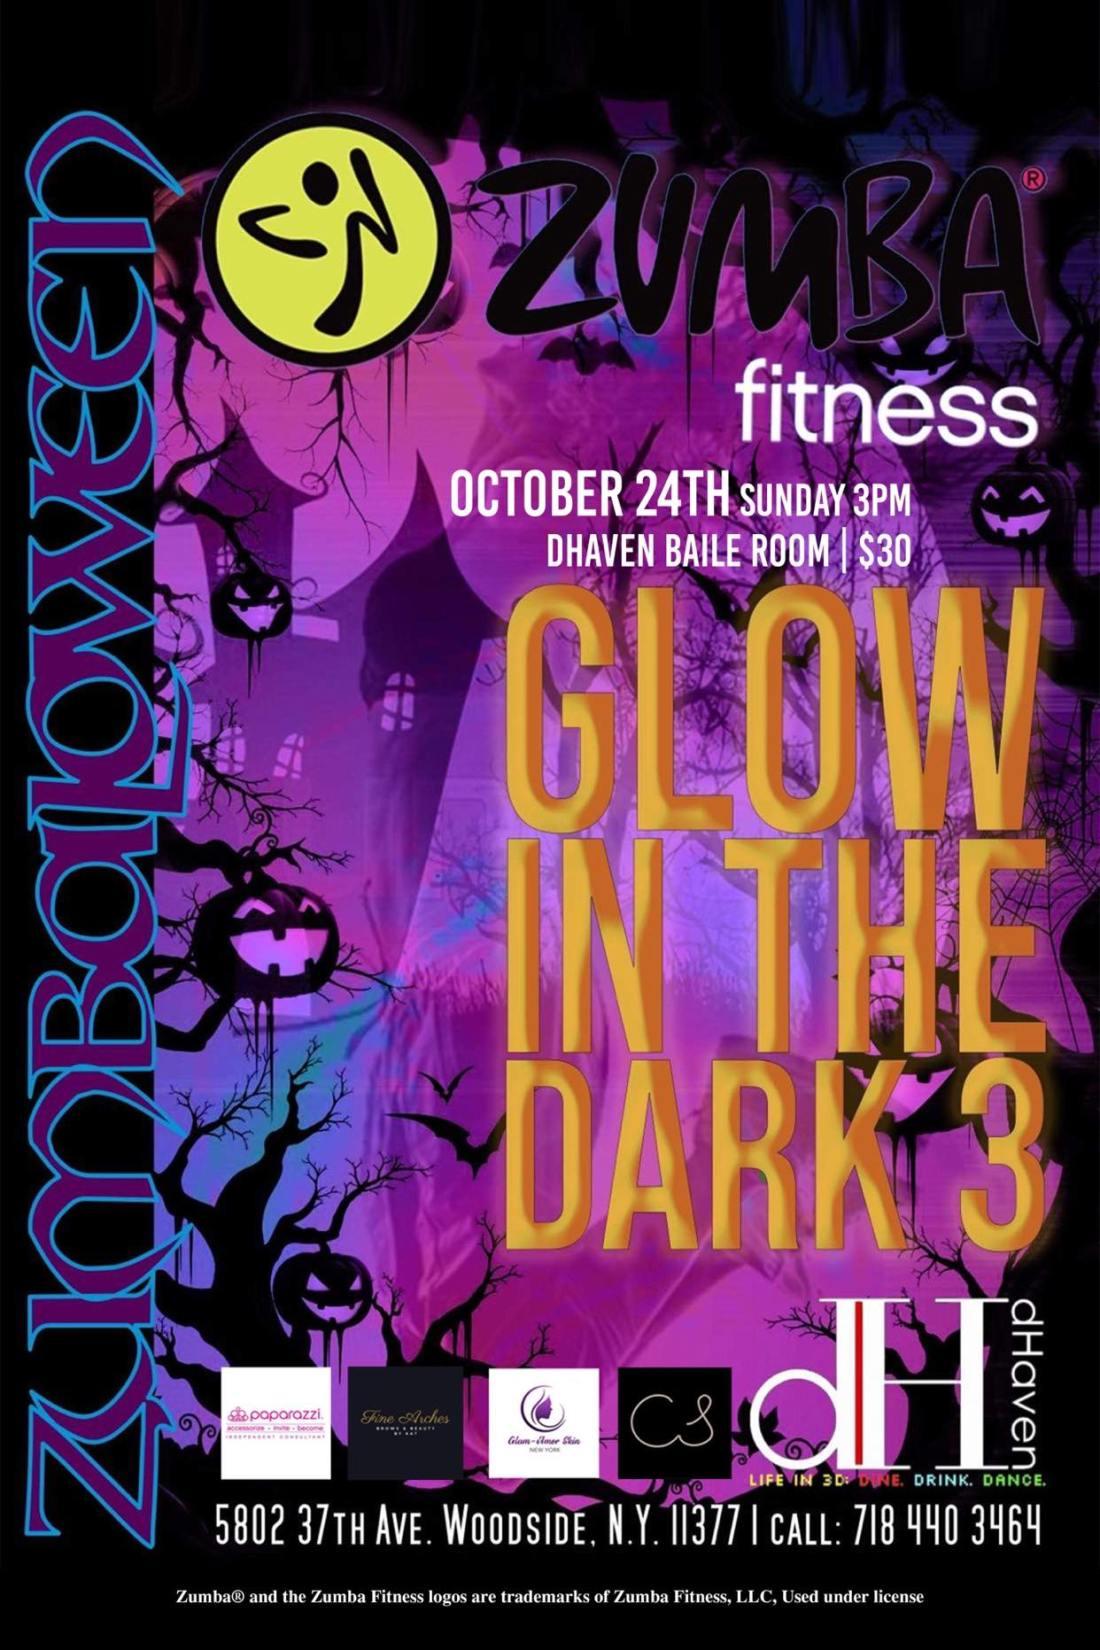 10-24-21 3pm $30 Baile room